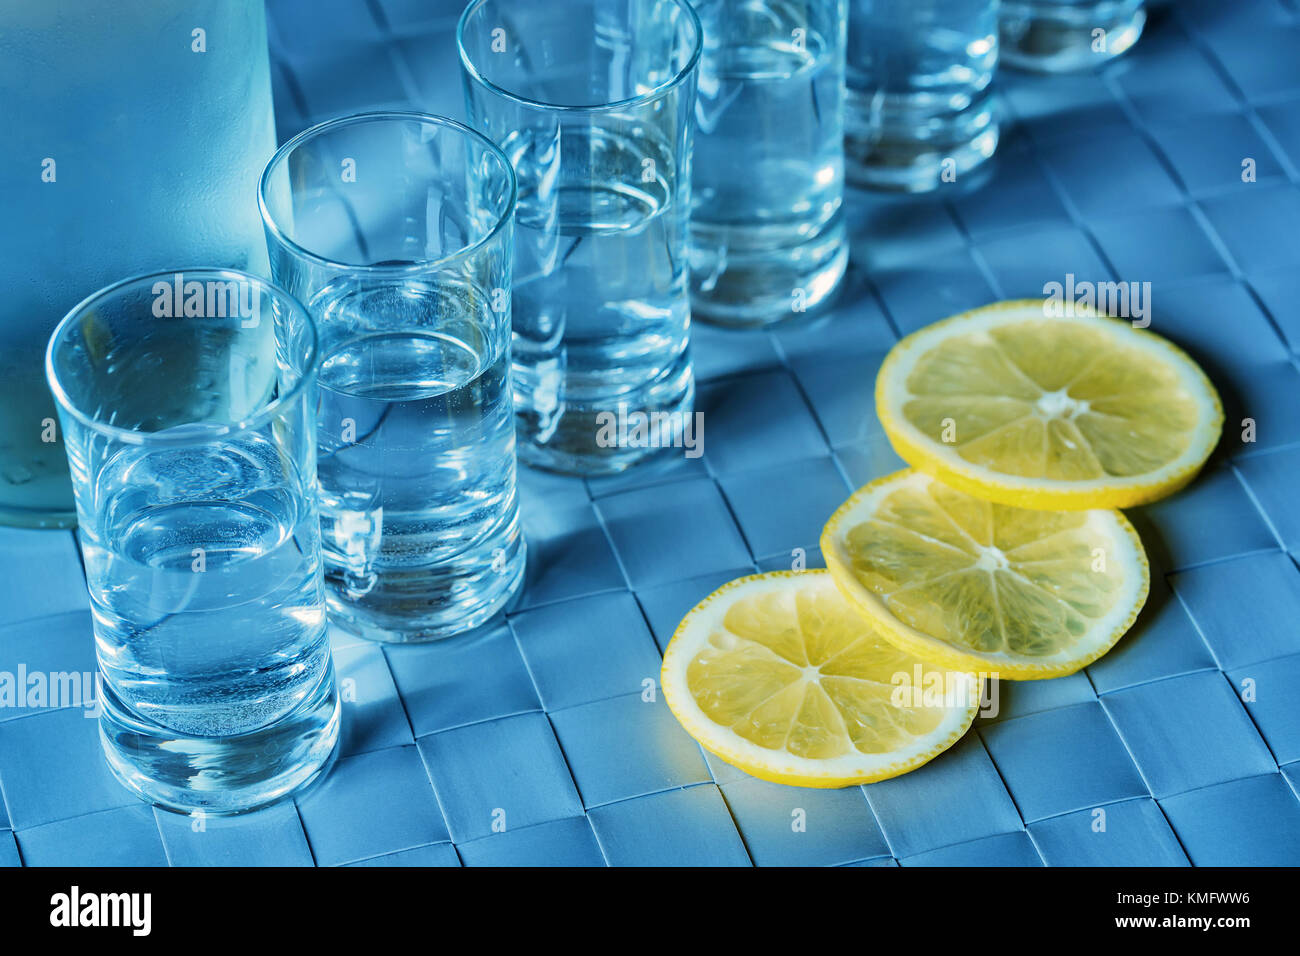 Vodka shot glass y limón sobre la superficie azul Imagen De Stock